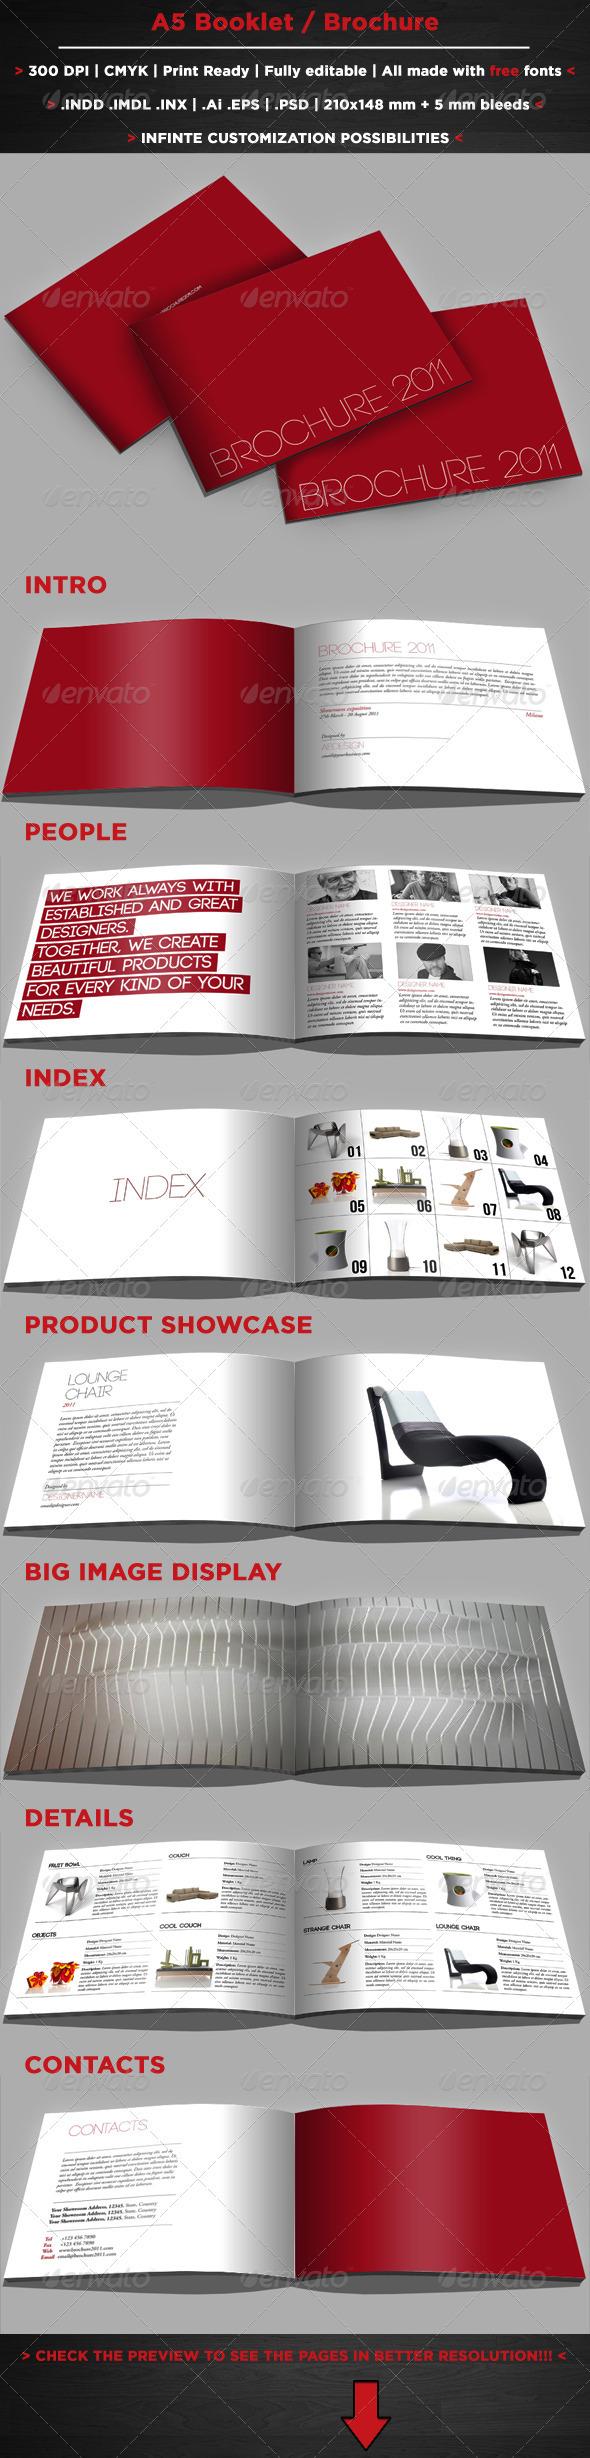 Impressive Templates for Brochures